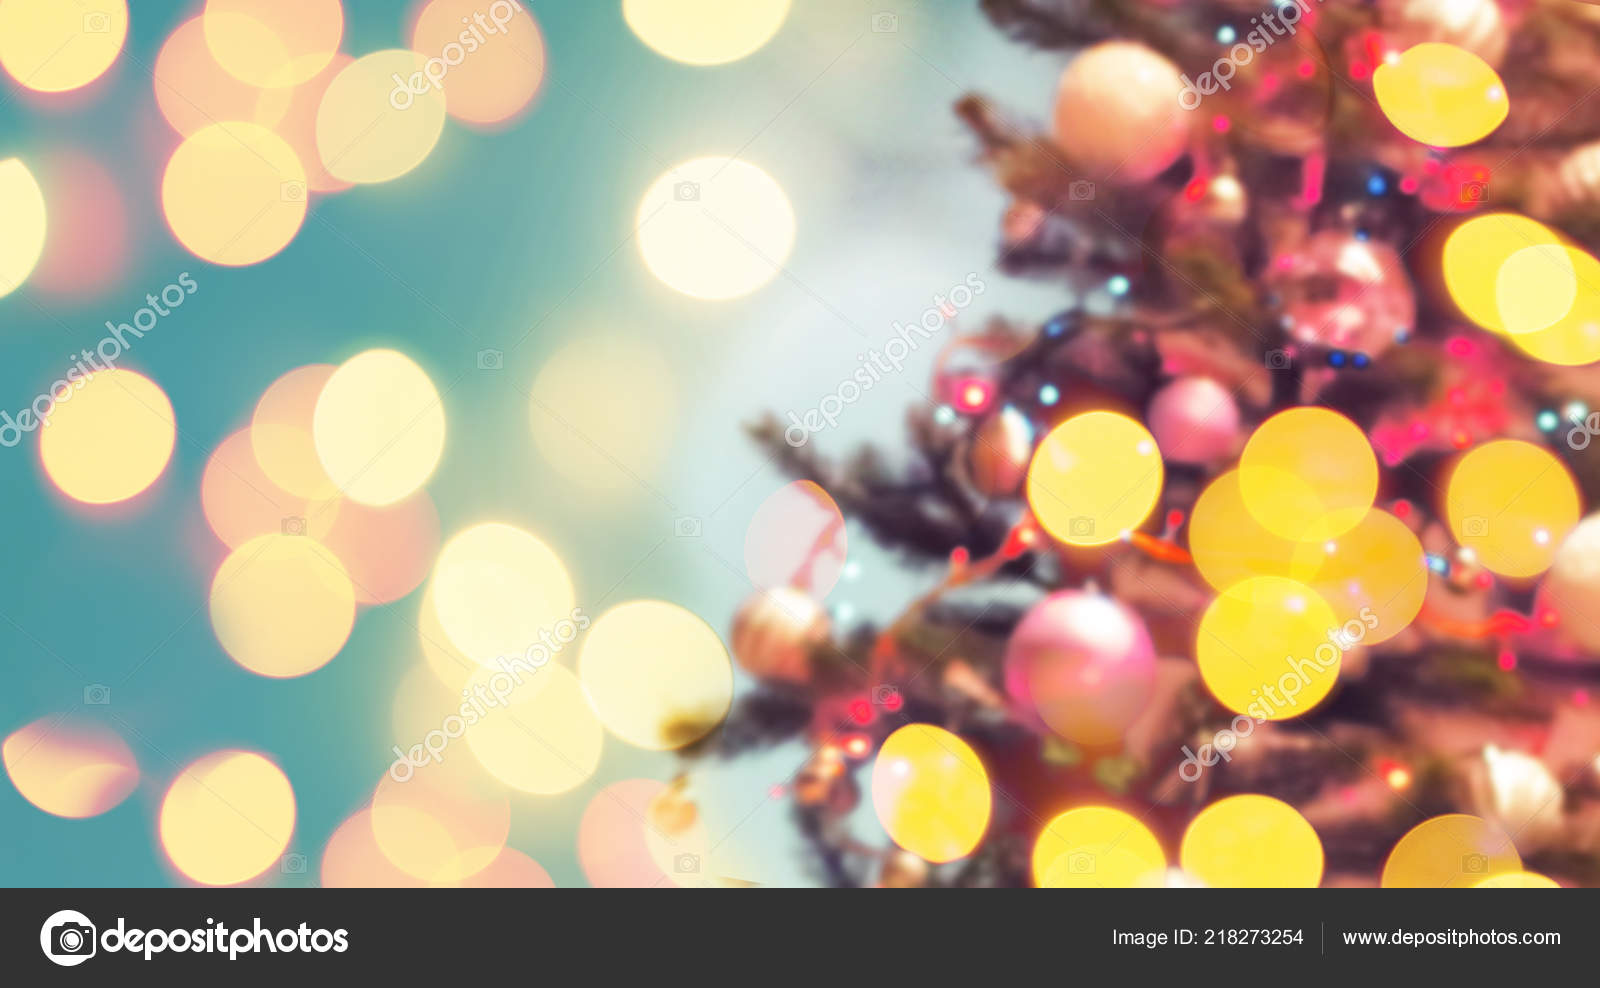 Colorful Christmas Tree Decorations Vintage Style Blurred Background Stock Photo C Avgustin 218273254